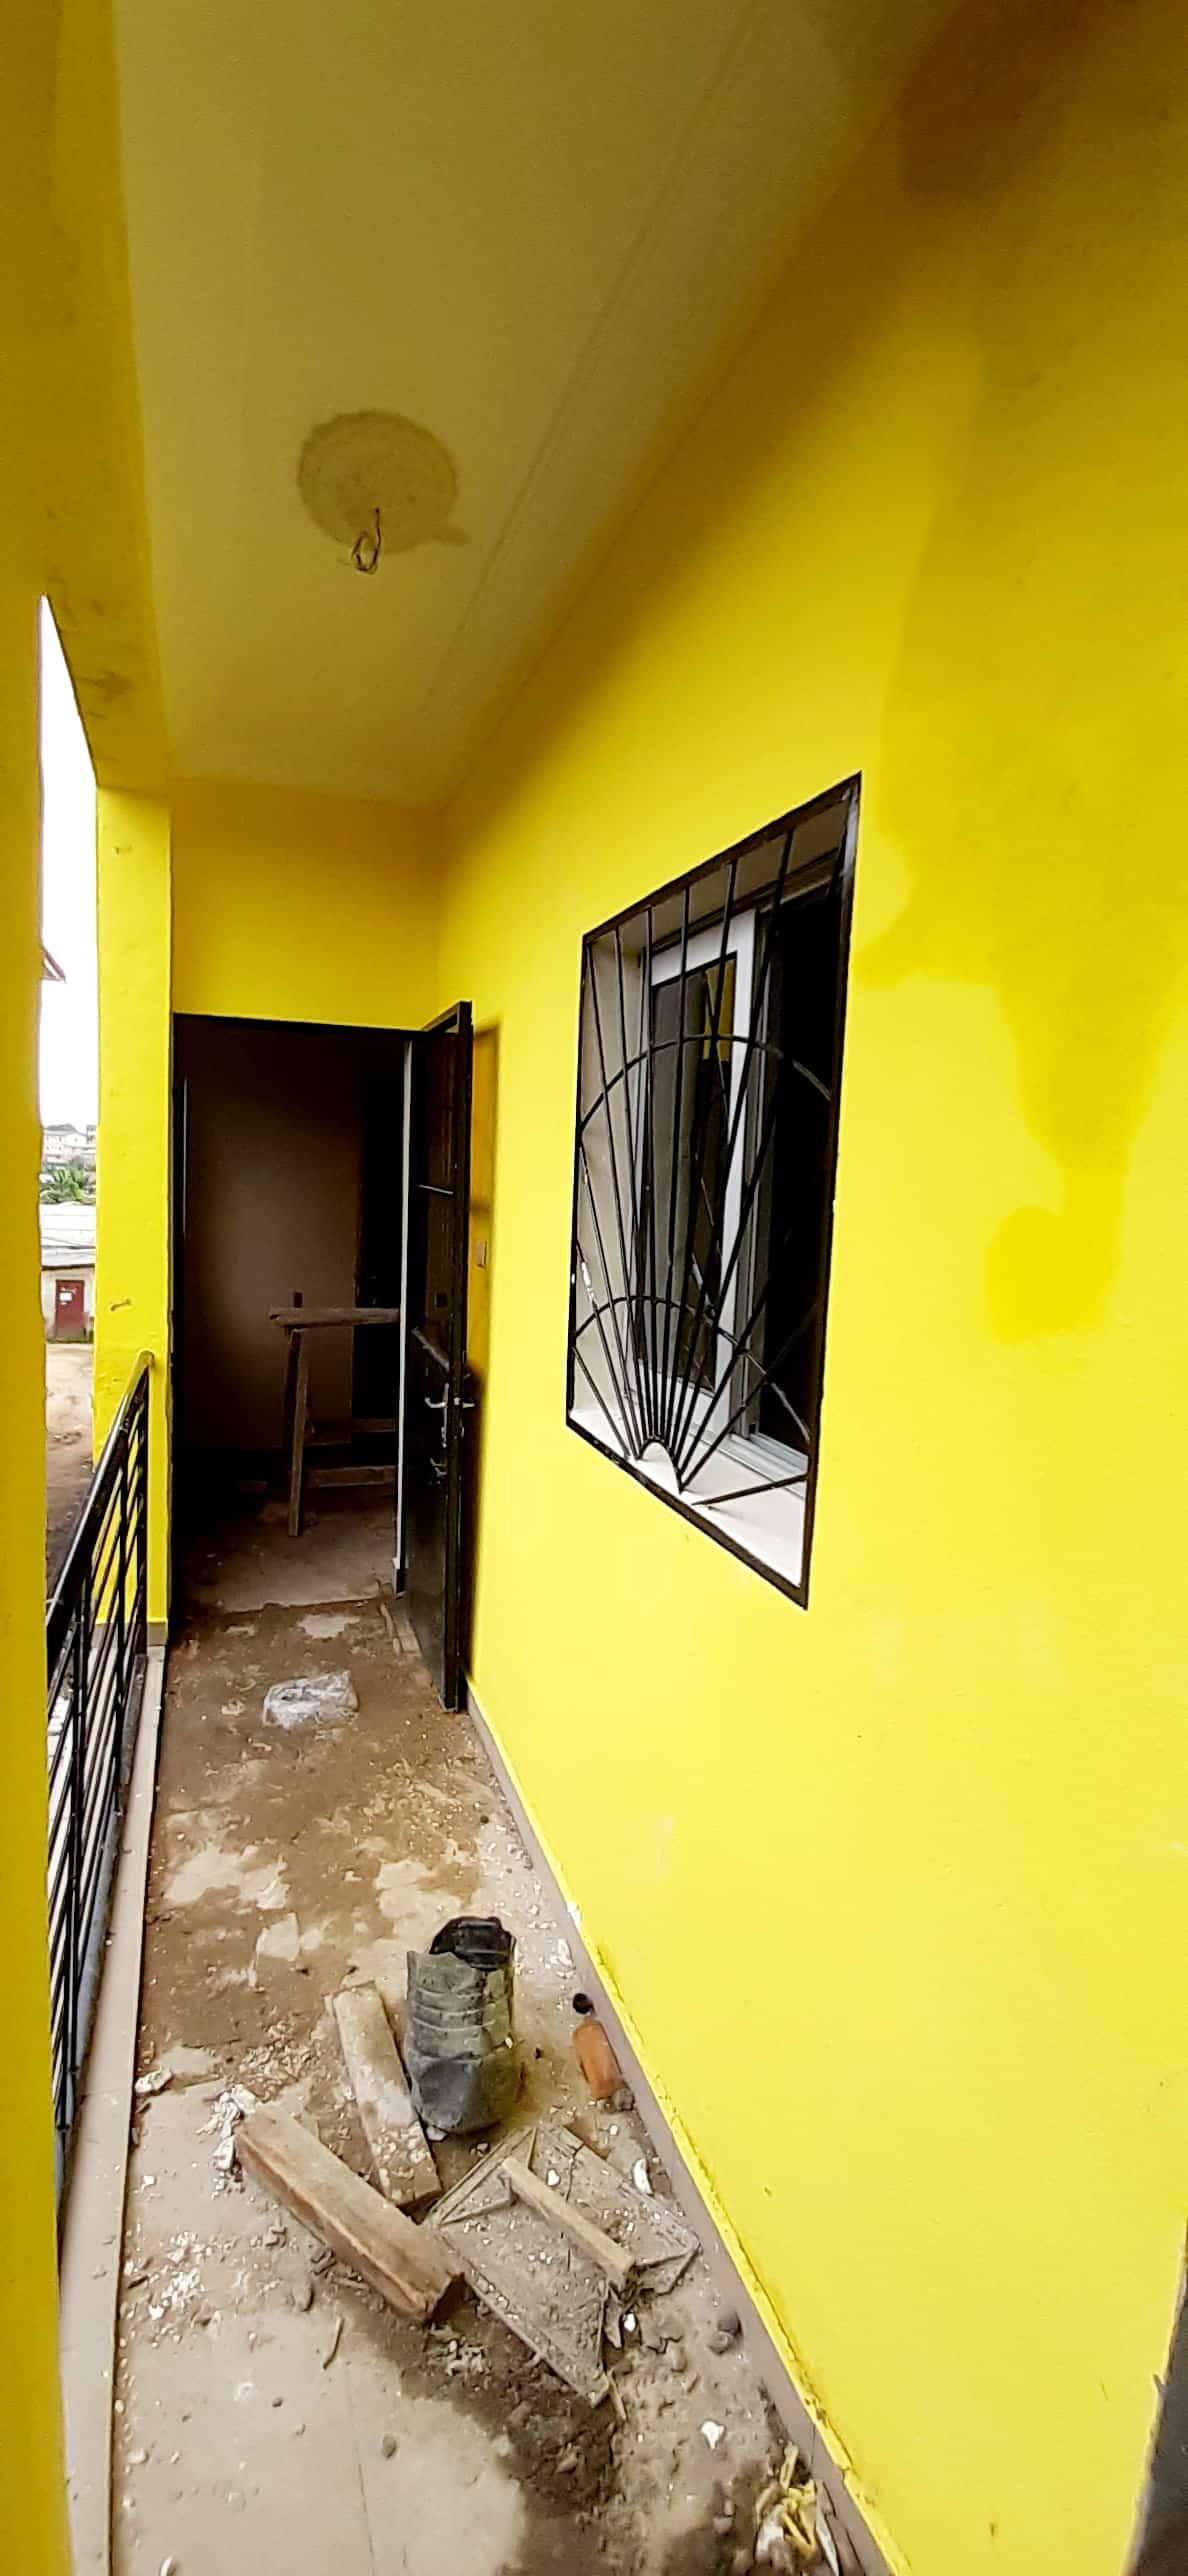 Studio to rent - Douala, Kotto, Kotto Nbangue - 75 000 FCFA / month